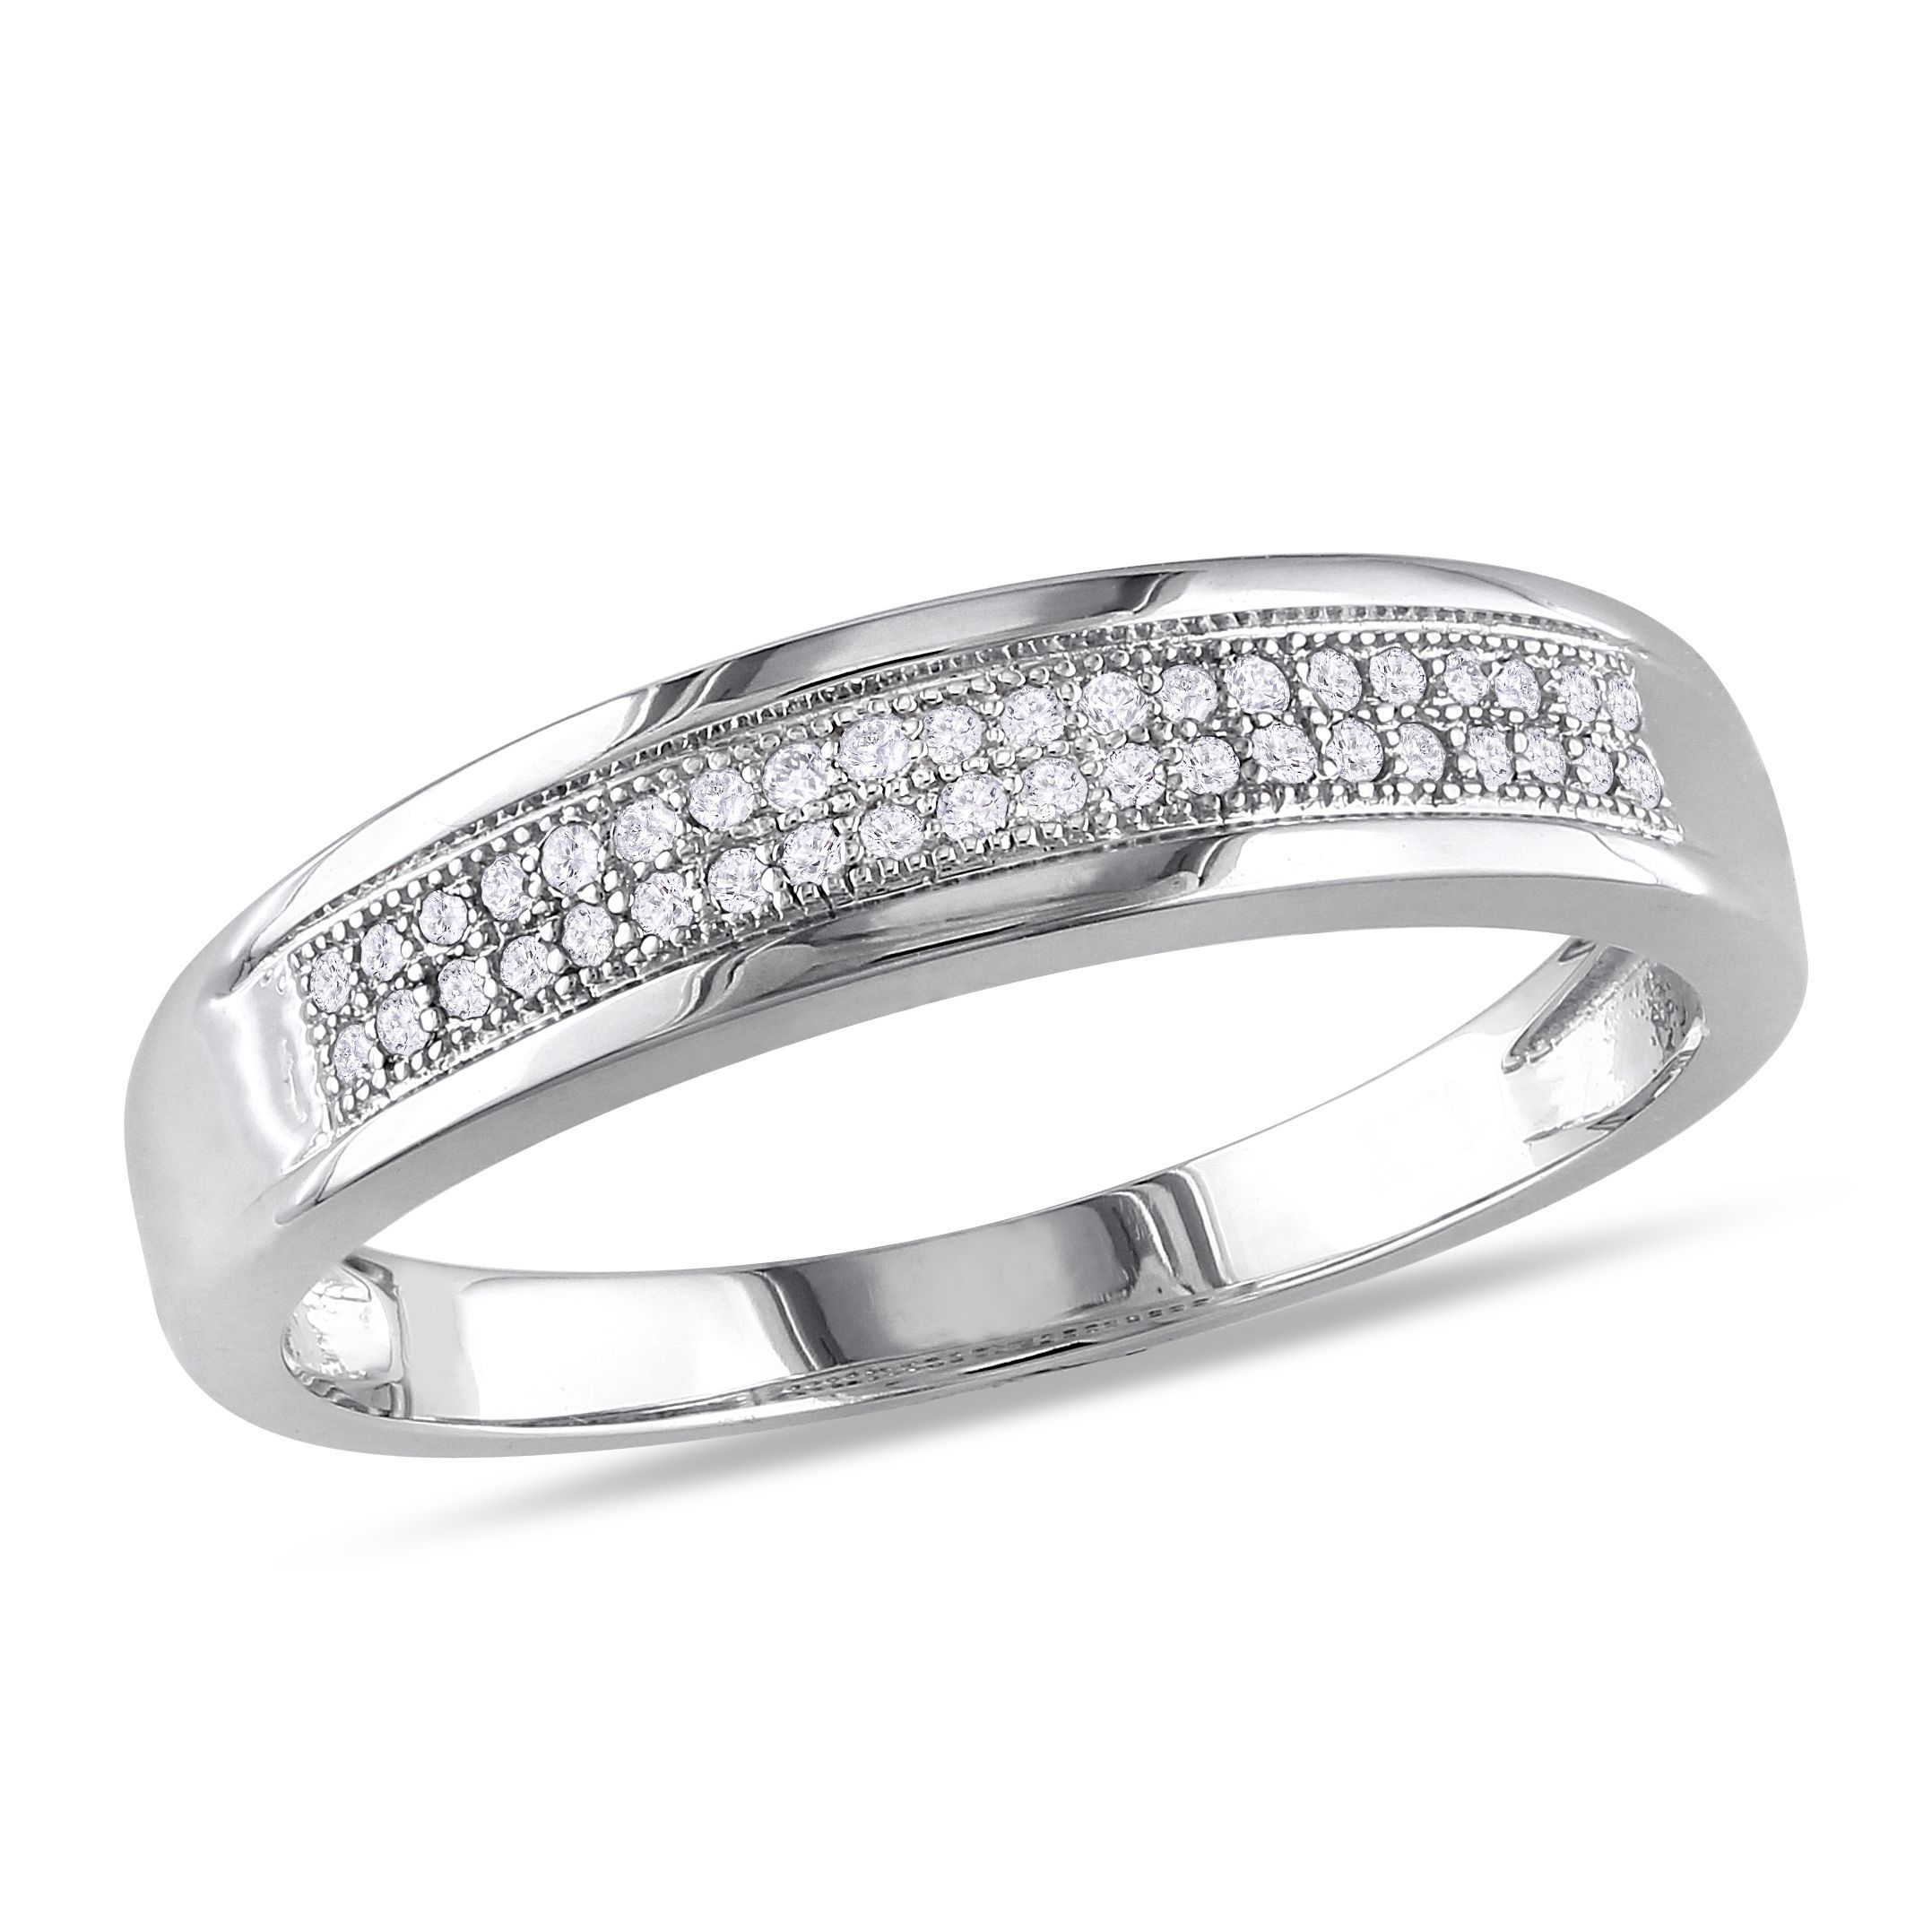 Miadora signature collection 14k white gold 1ct tdw diamond double row - Miadora 10k White Gold 1 8ct Tdw Double Row Diamond Wedding Band G H